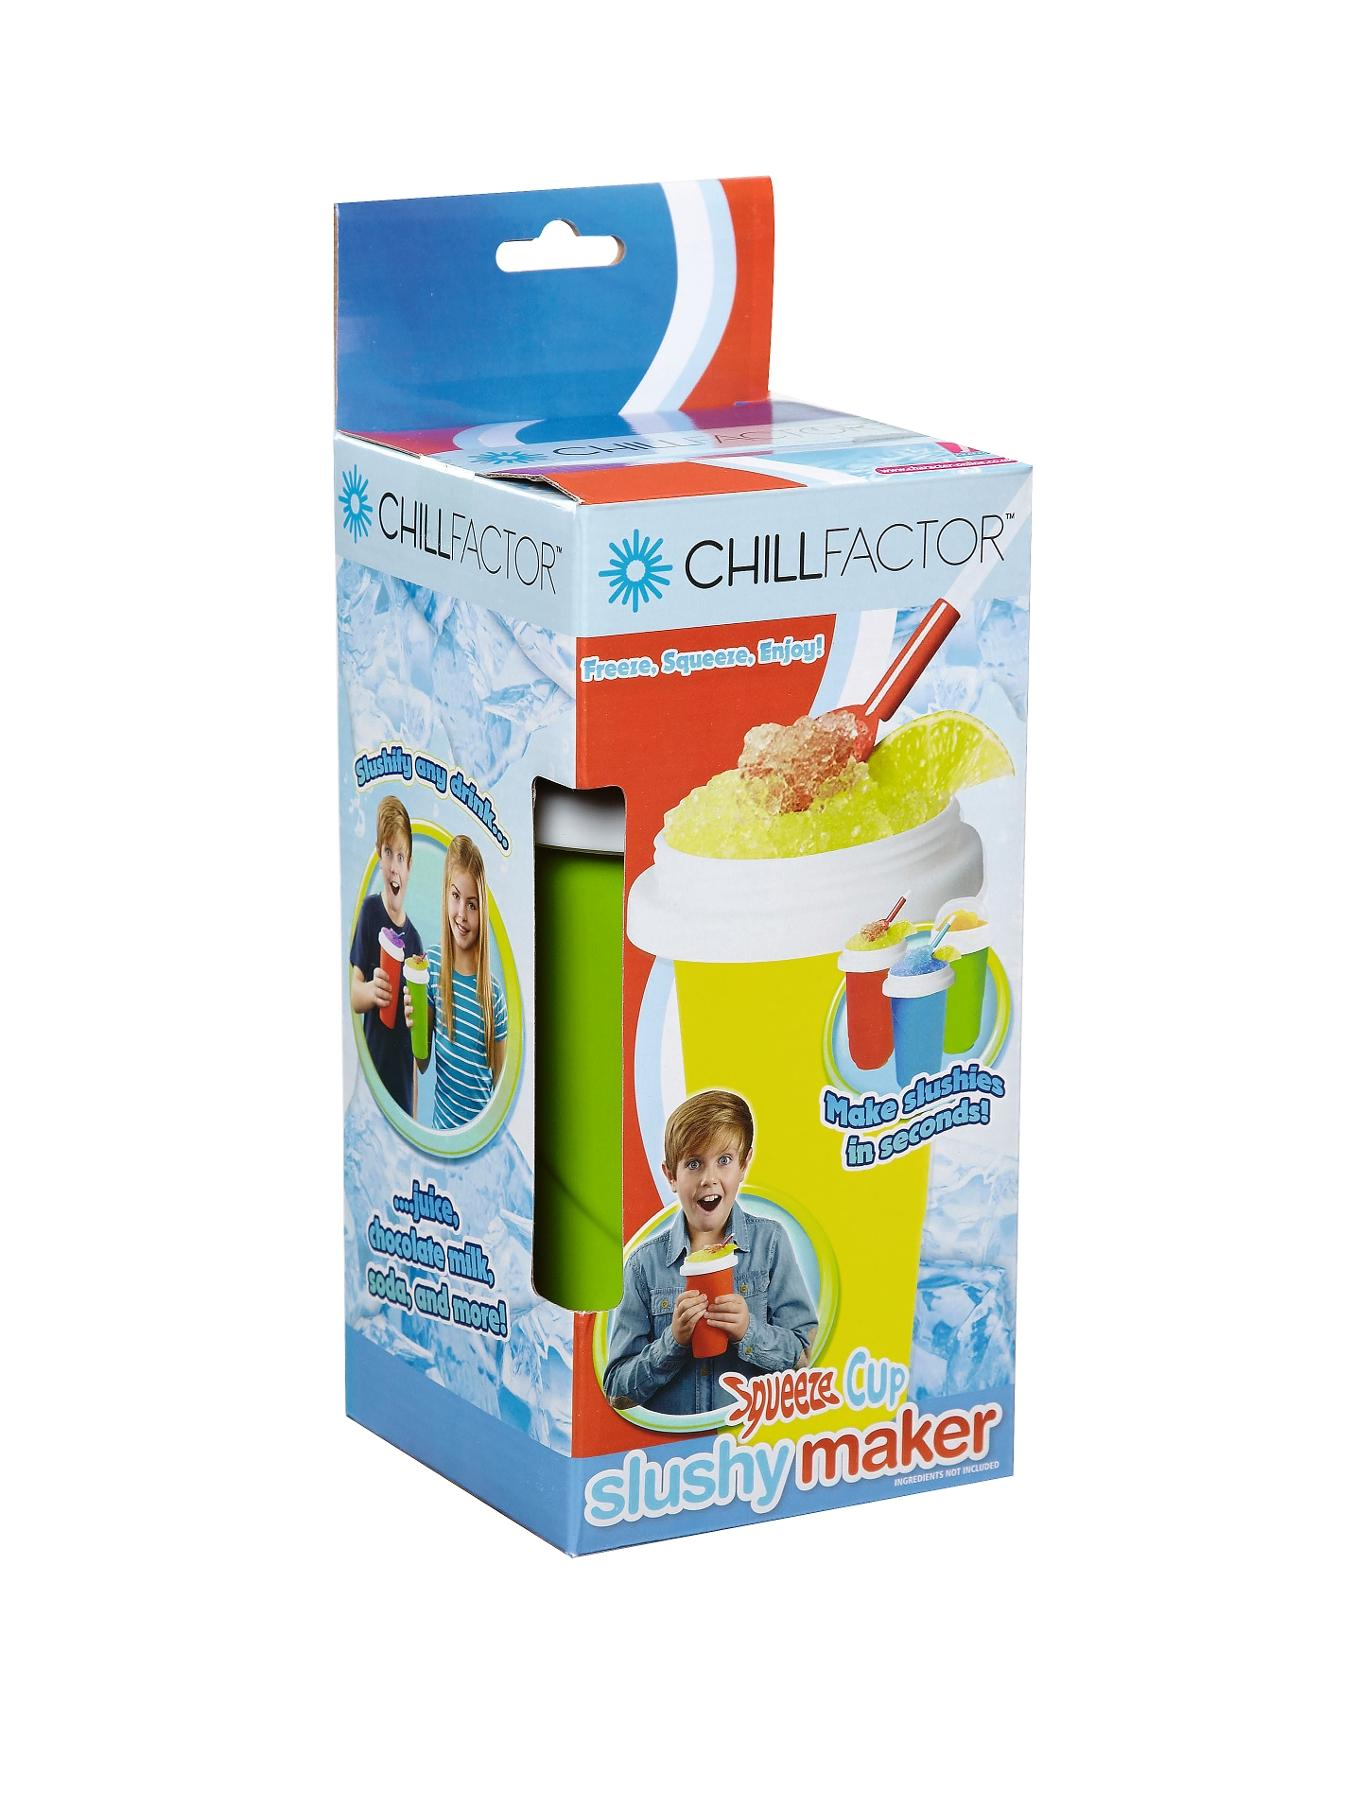 Squeeze Cup Slushy Maker